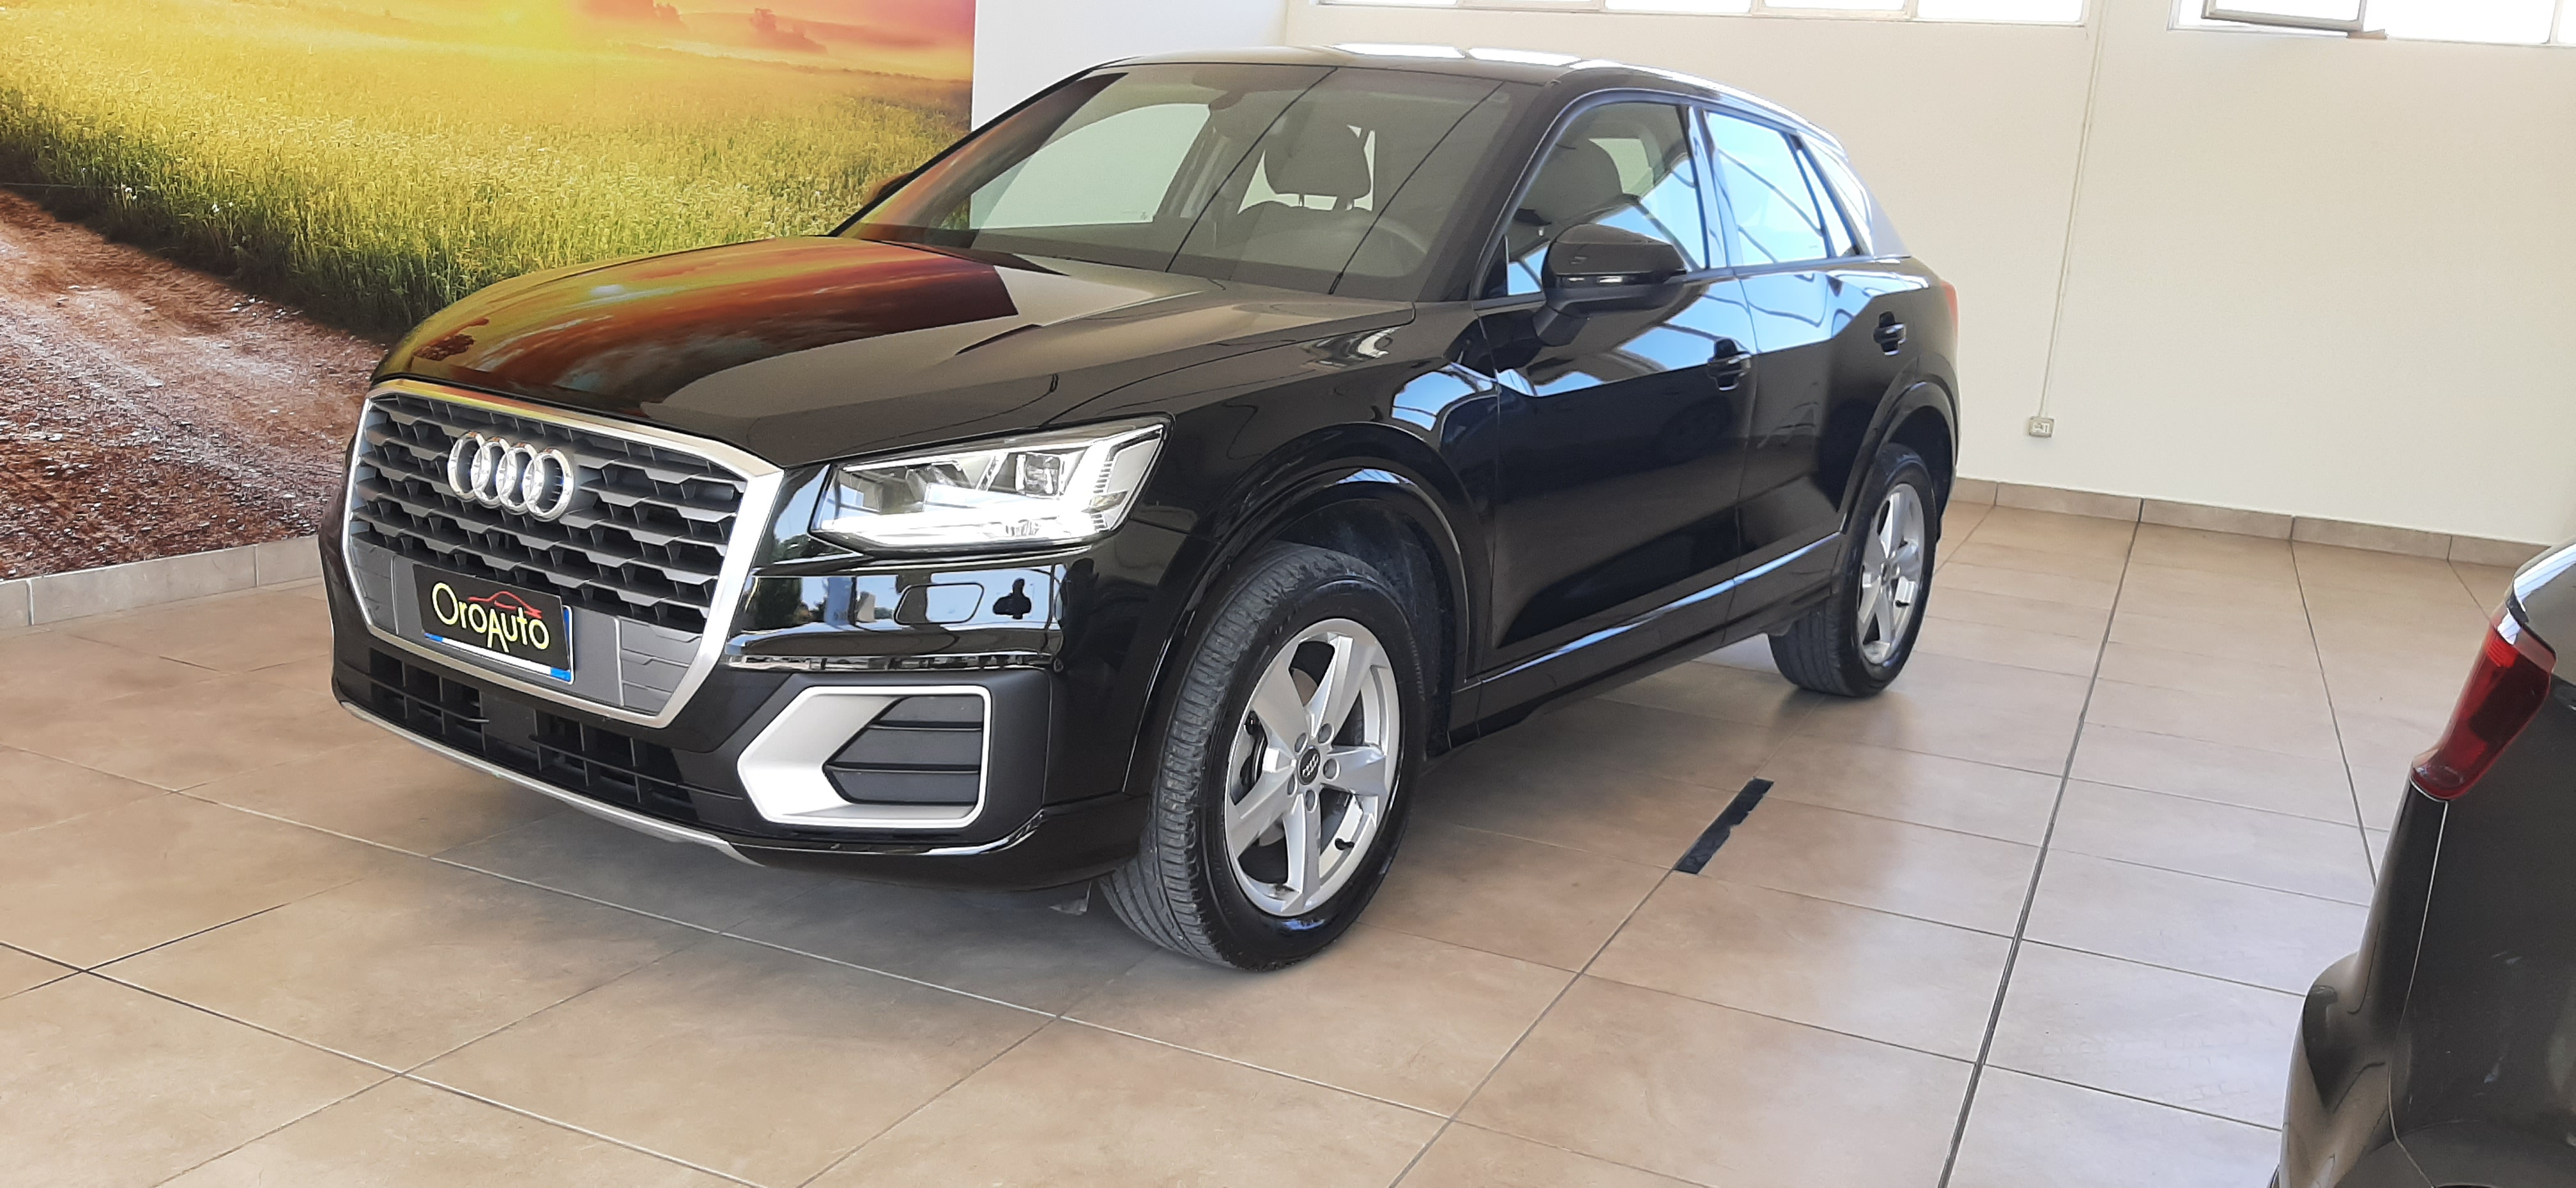 Audi Q2 30 1.0 tfsi Admired-UNIPROPRIETARIO-XENO-NAVI…..